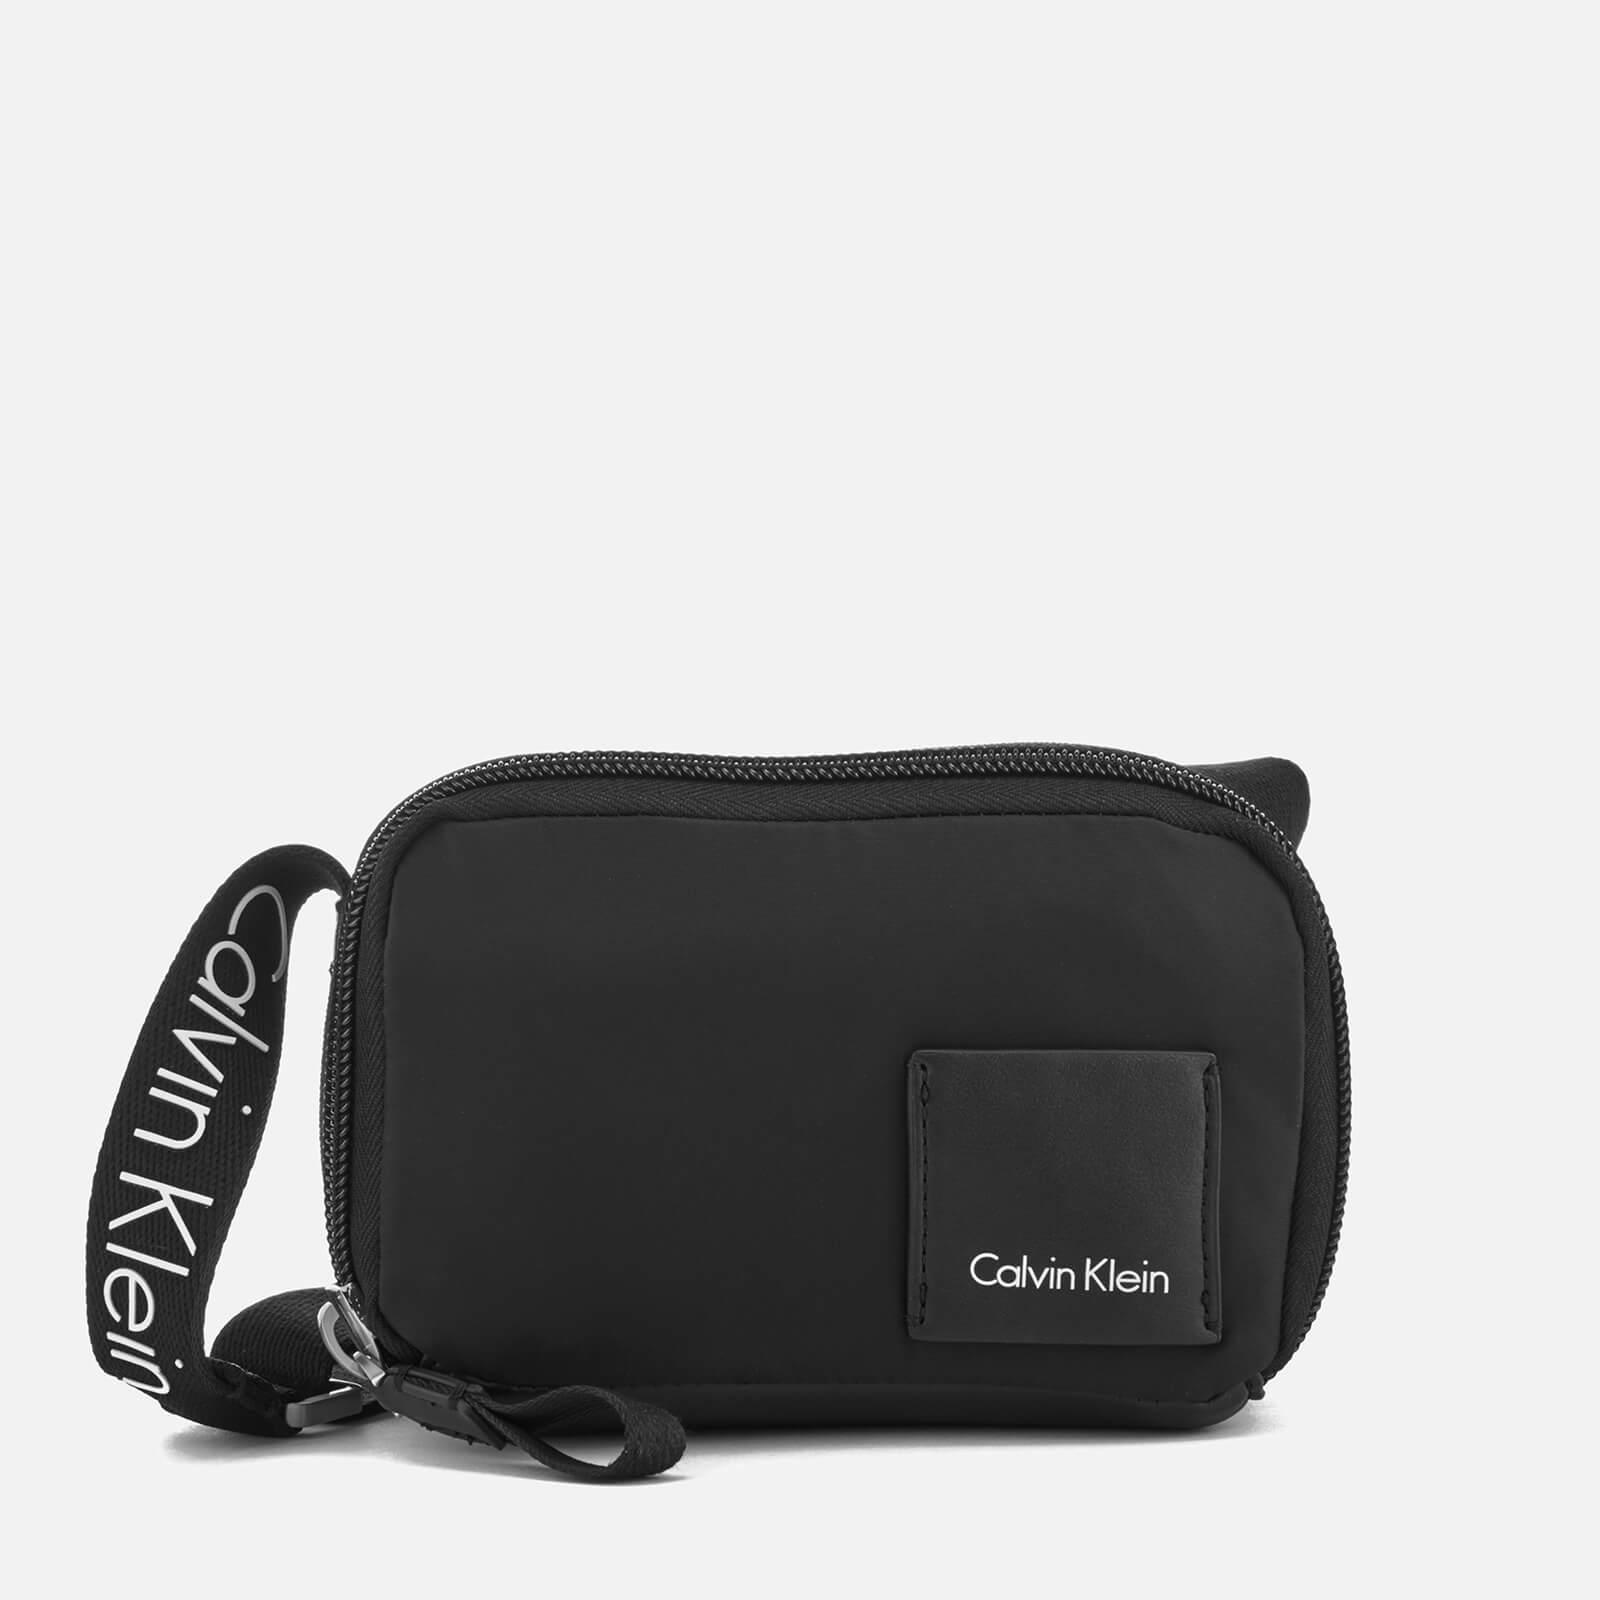 8ad79ddc23 Calvin Klein Women's Fluid Small Cross Body Bag - Black Womens Accessories  | TheHut.com